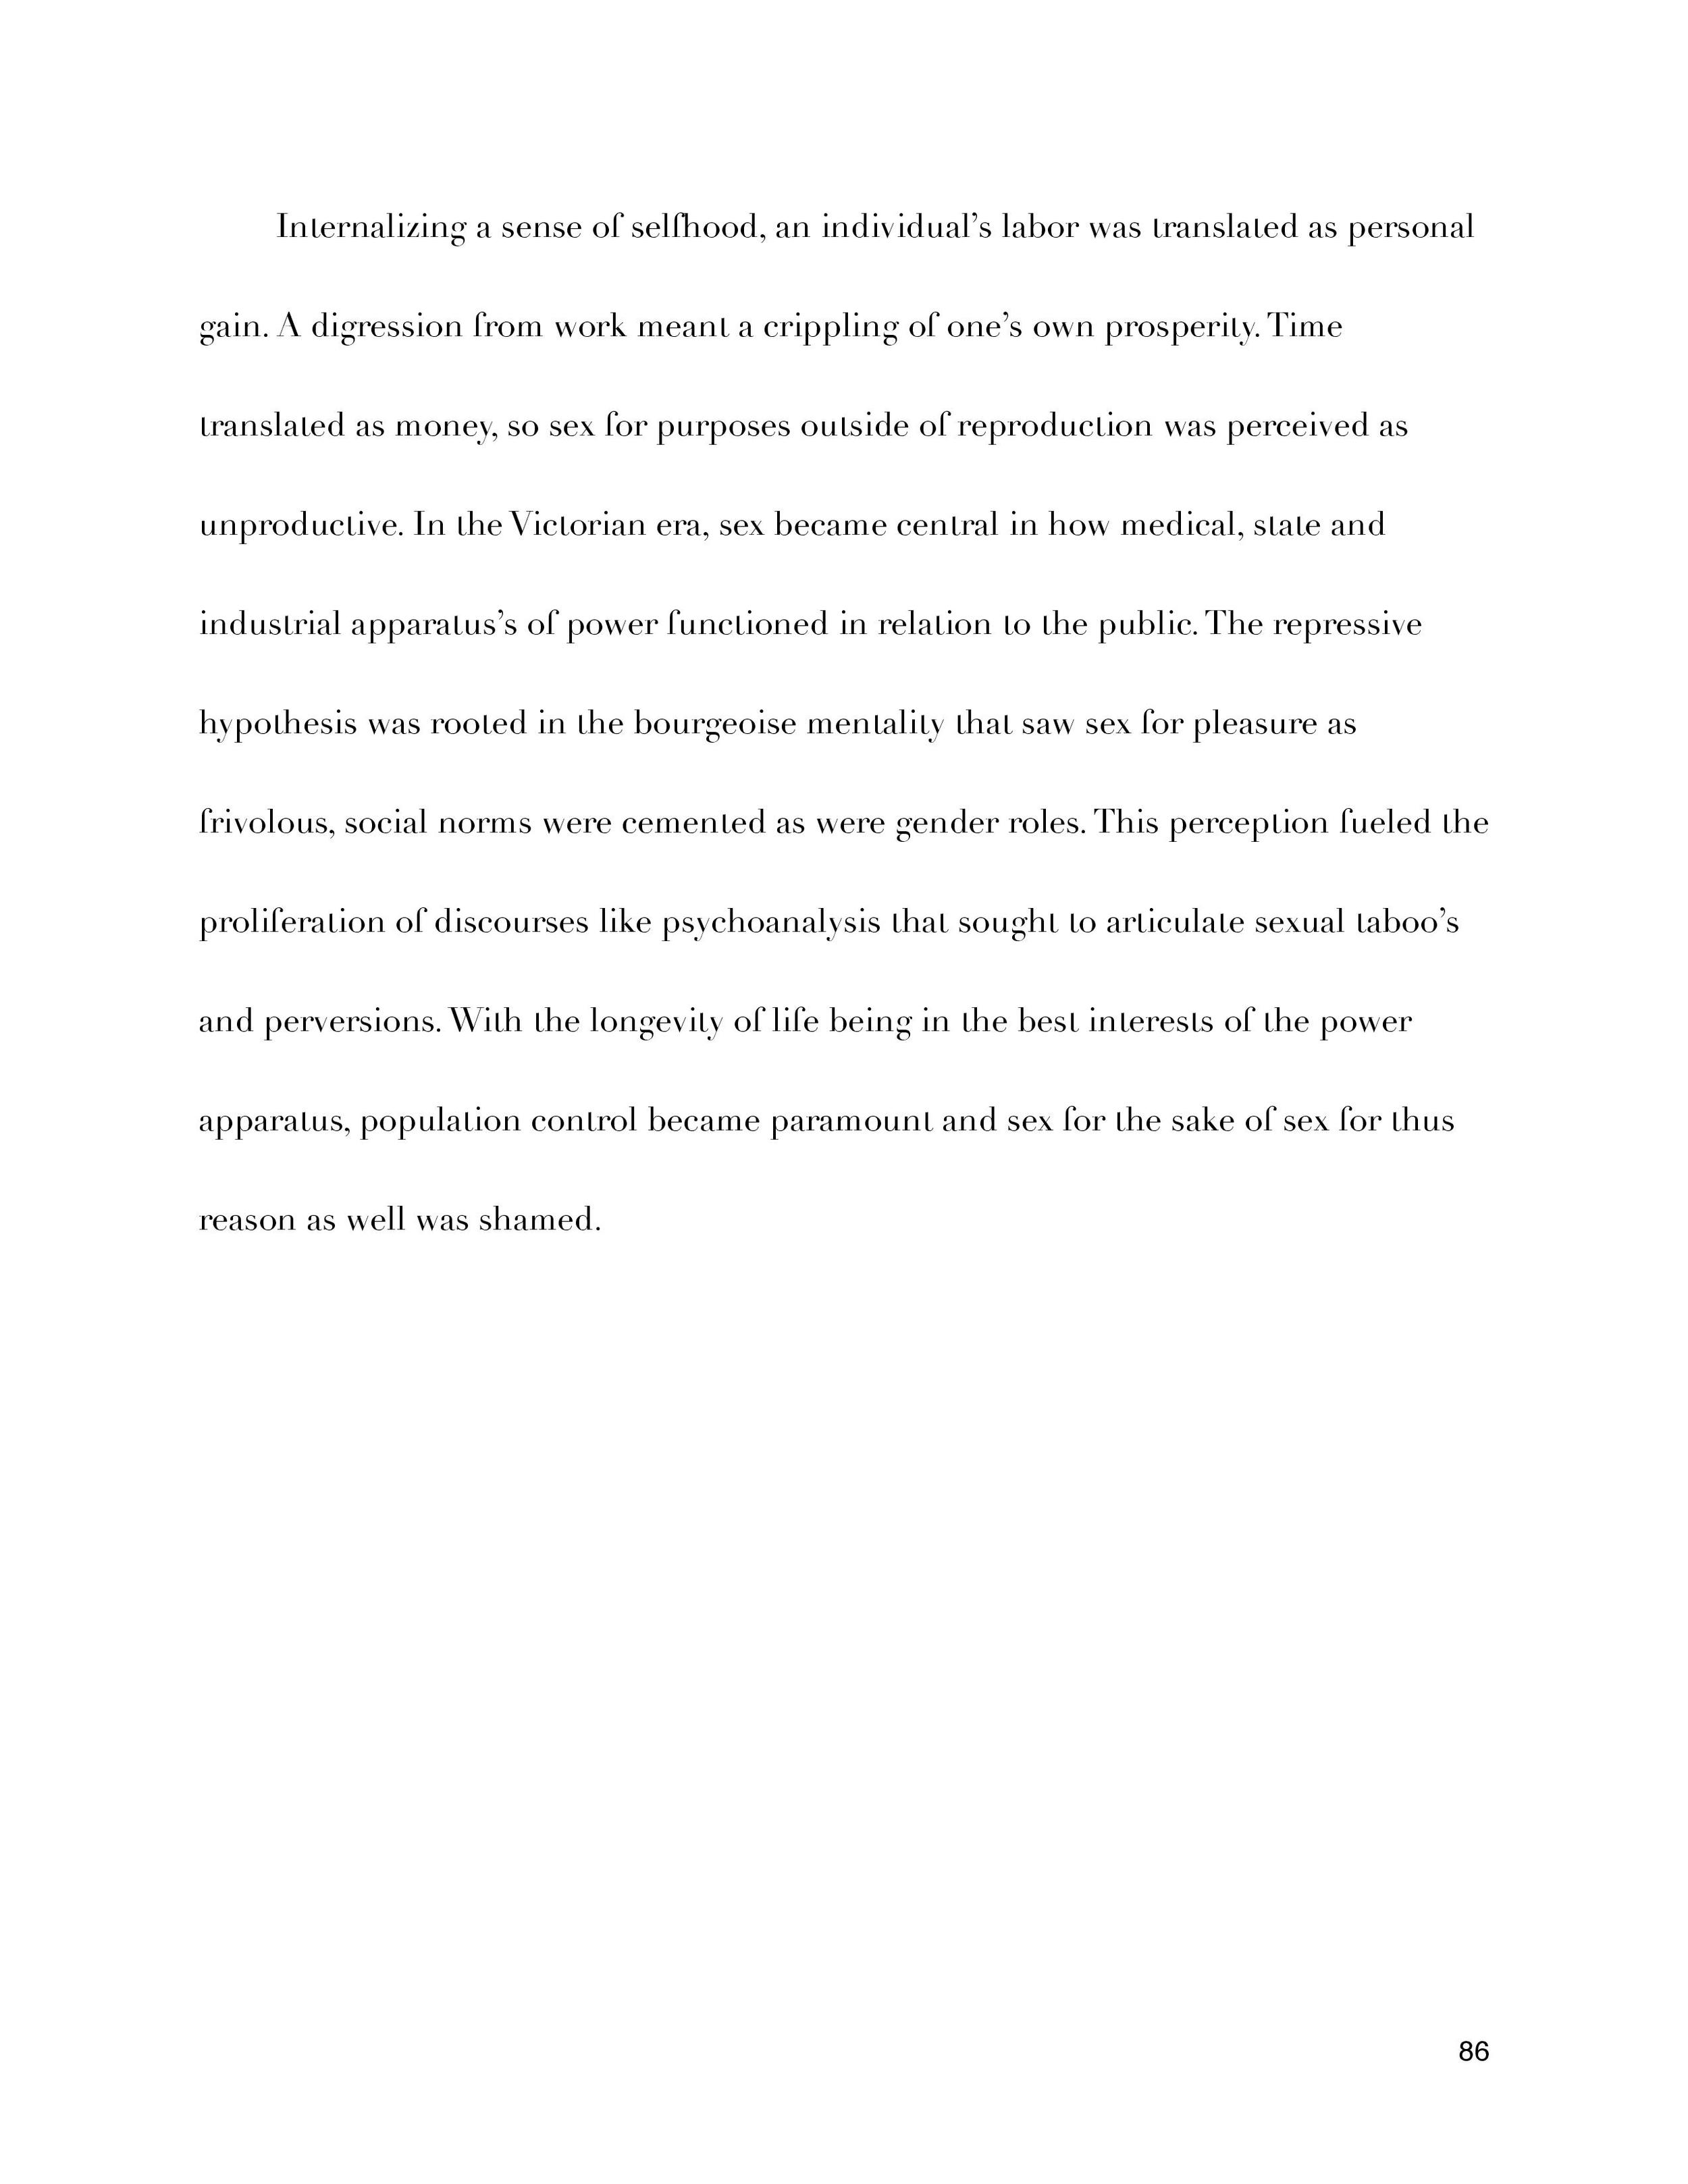 ShatteredGlass-page-087.jpg